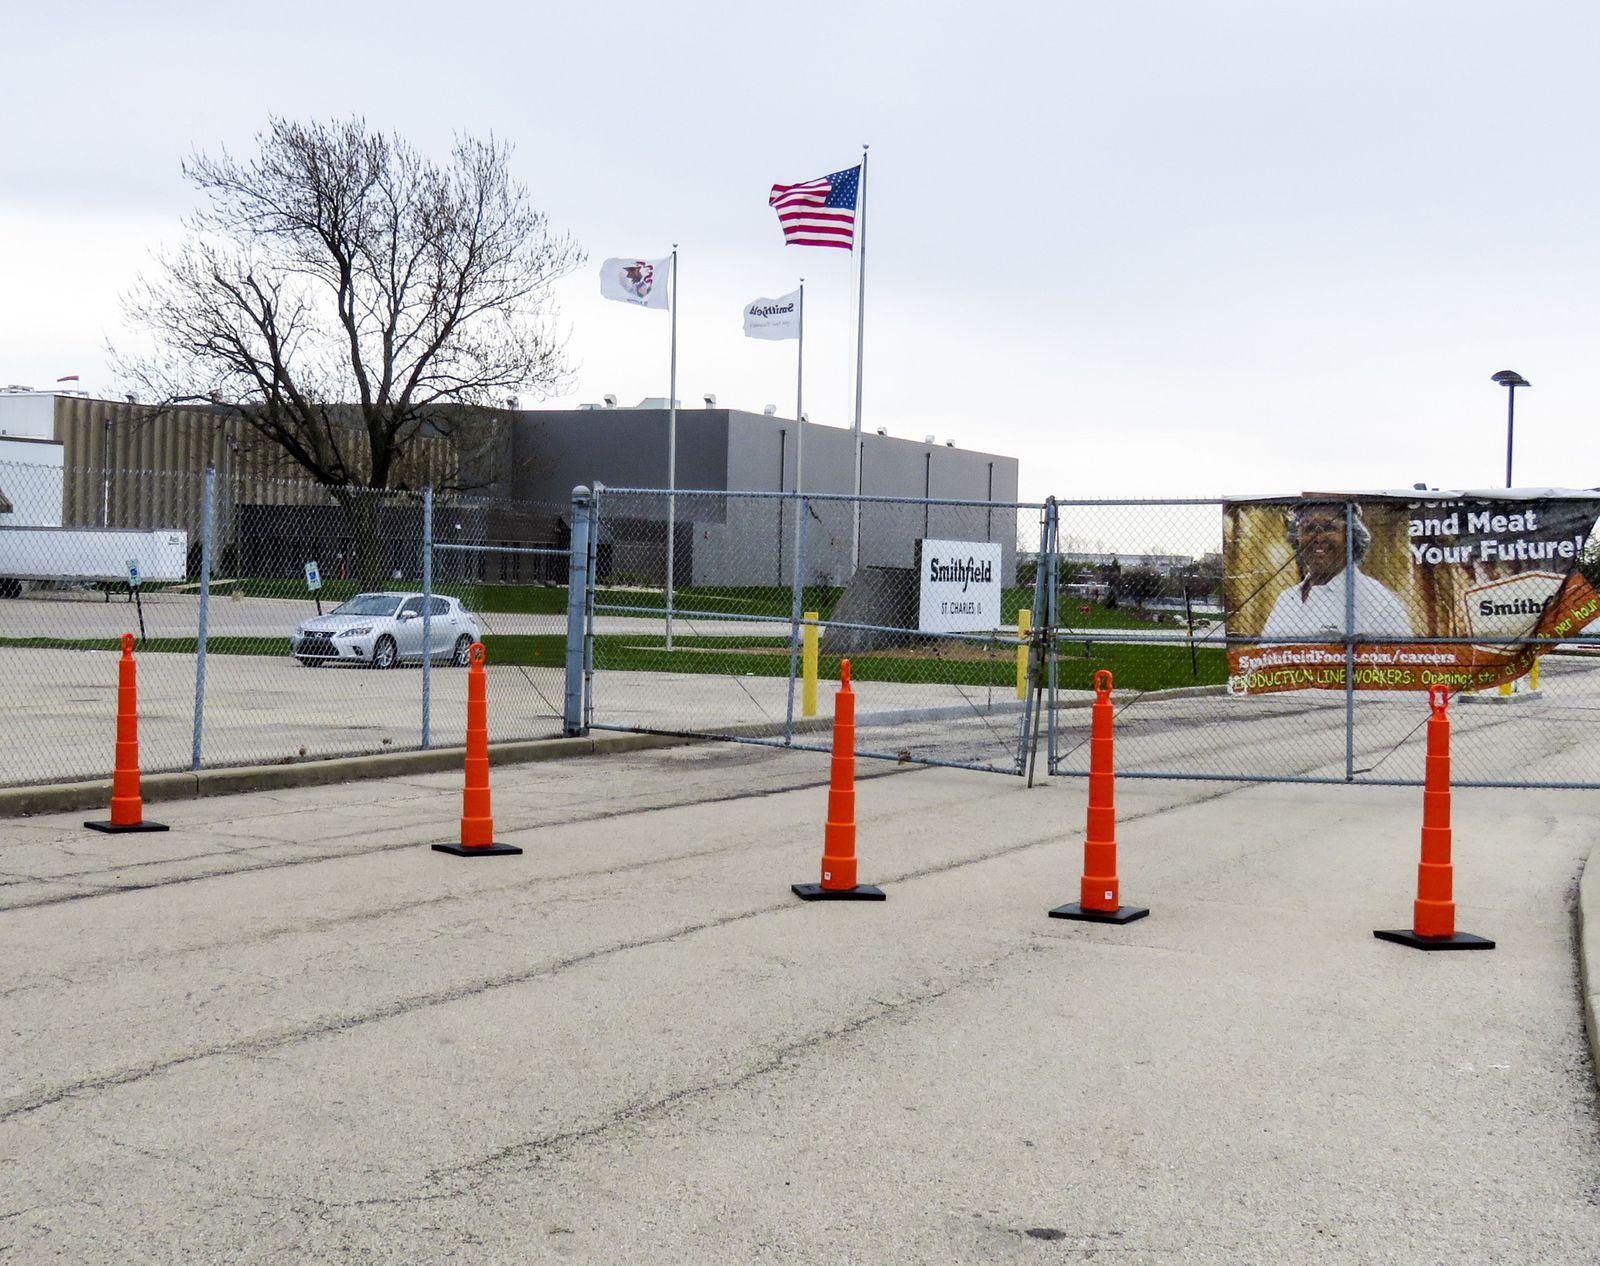 Coronavirus Covid-19 50th Smithfield pork processing plant closes, St Charles, USA - 10 Apr 2020